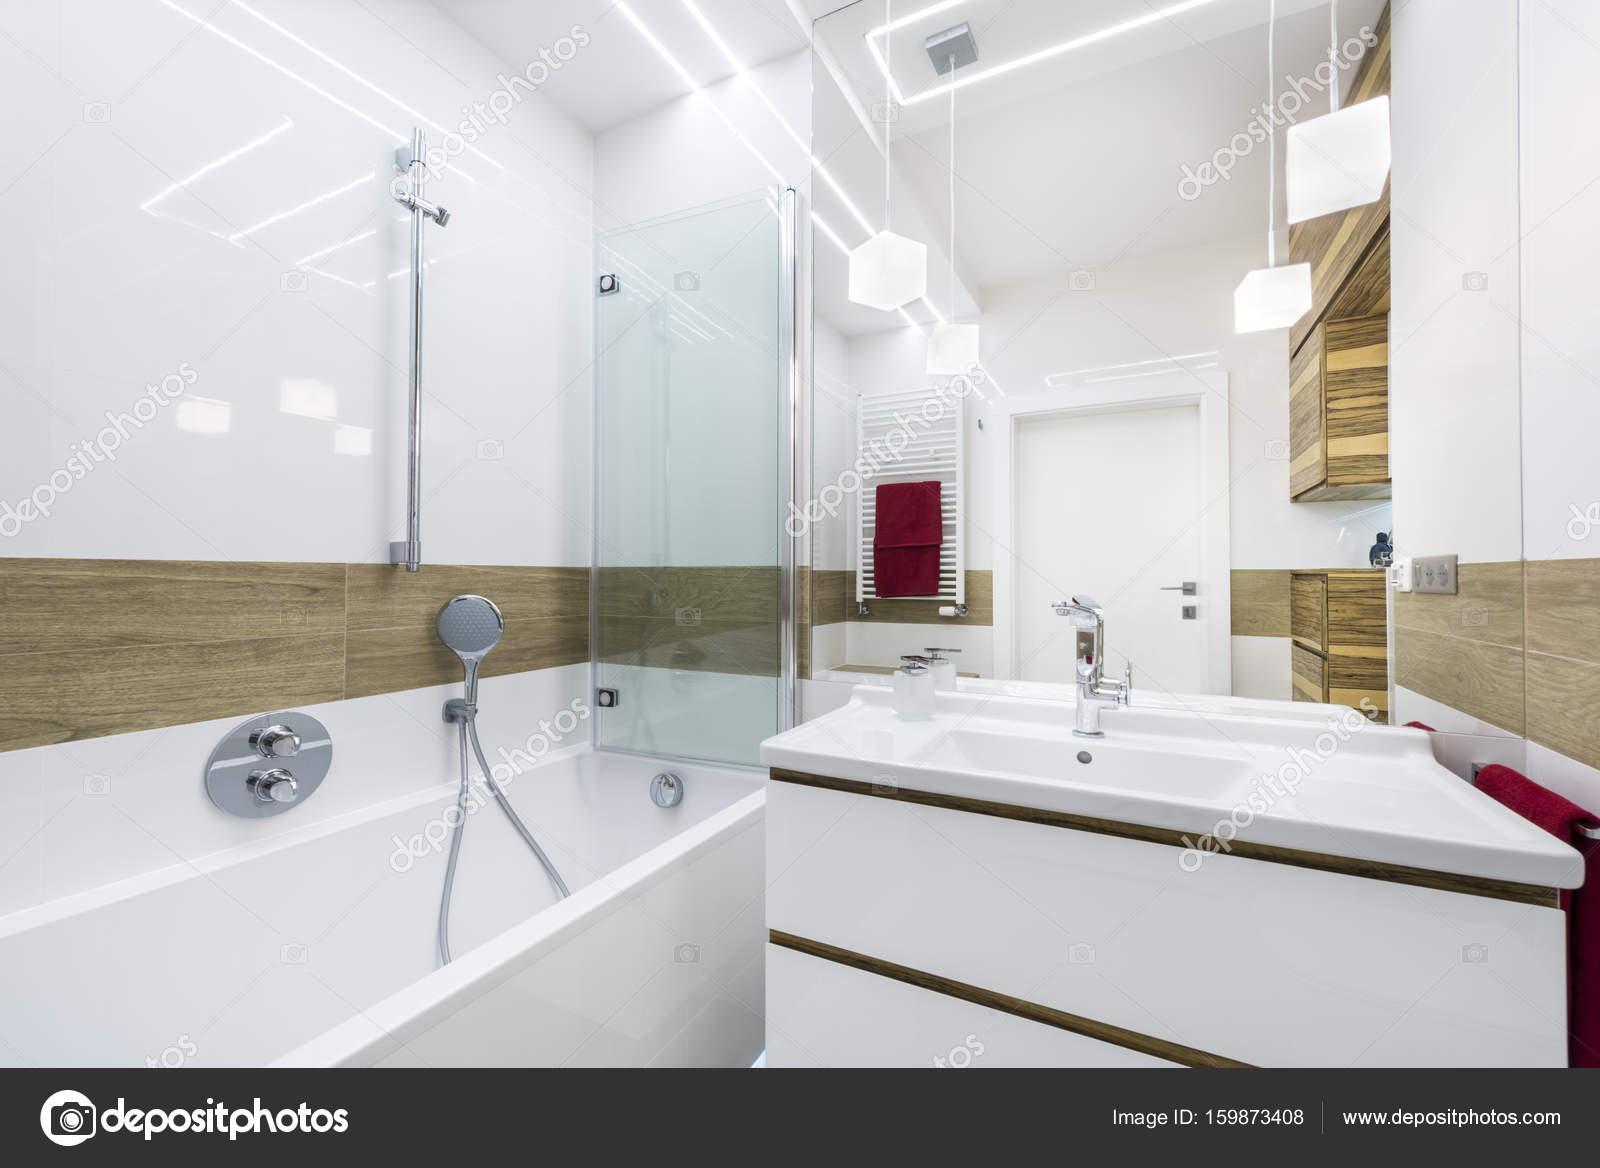 Moderne luxe badkamer met bad — Stockfoto © jacek_kadaj #159873408